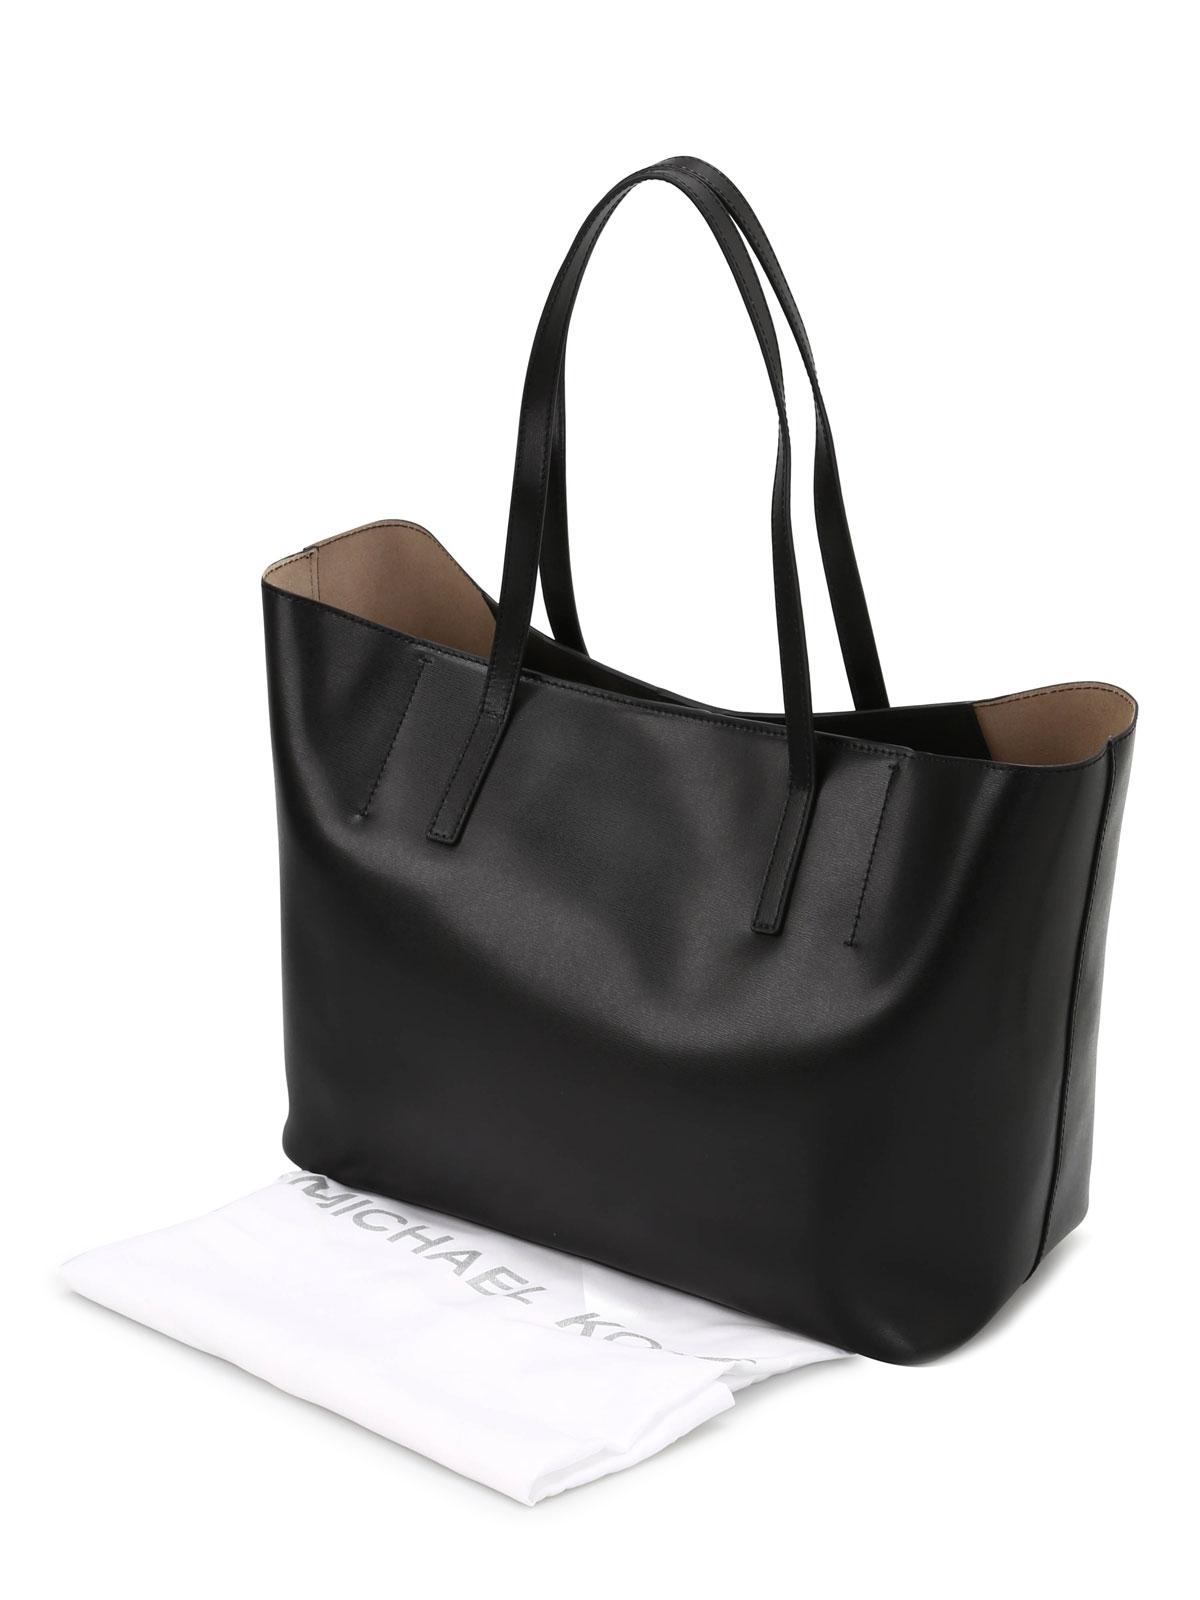 61d0e56c89fc Michael Kors - Emry large tote - totes bags - 30F6GE4T3L 001